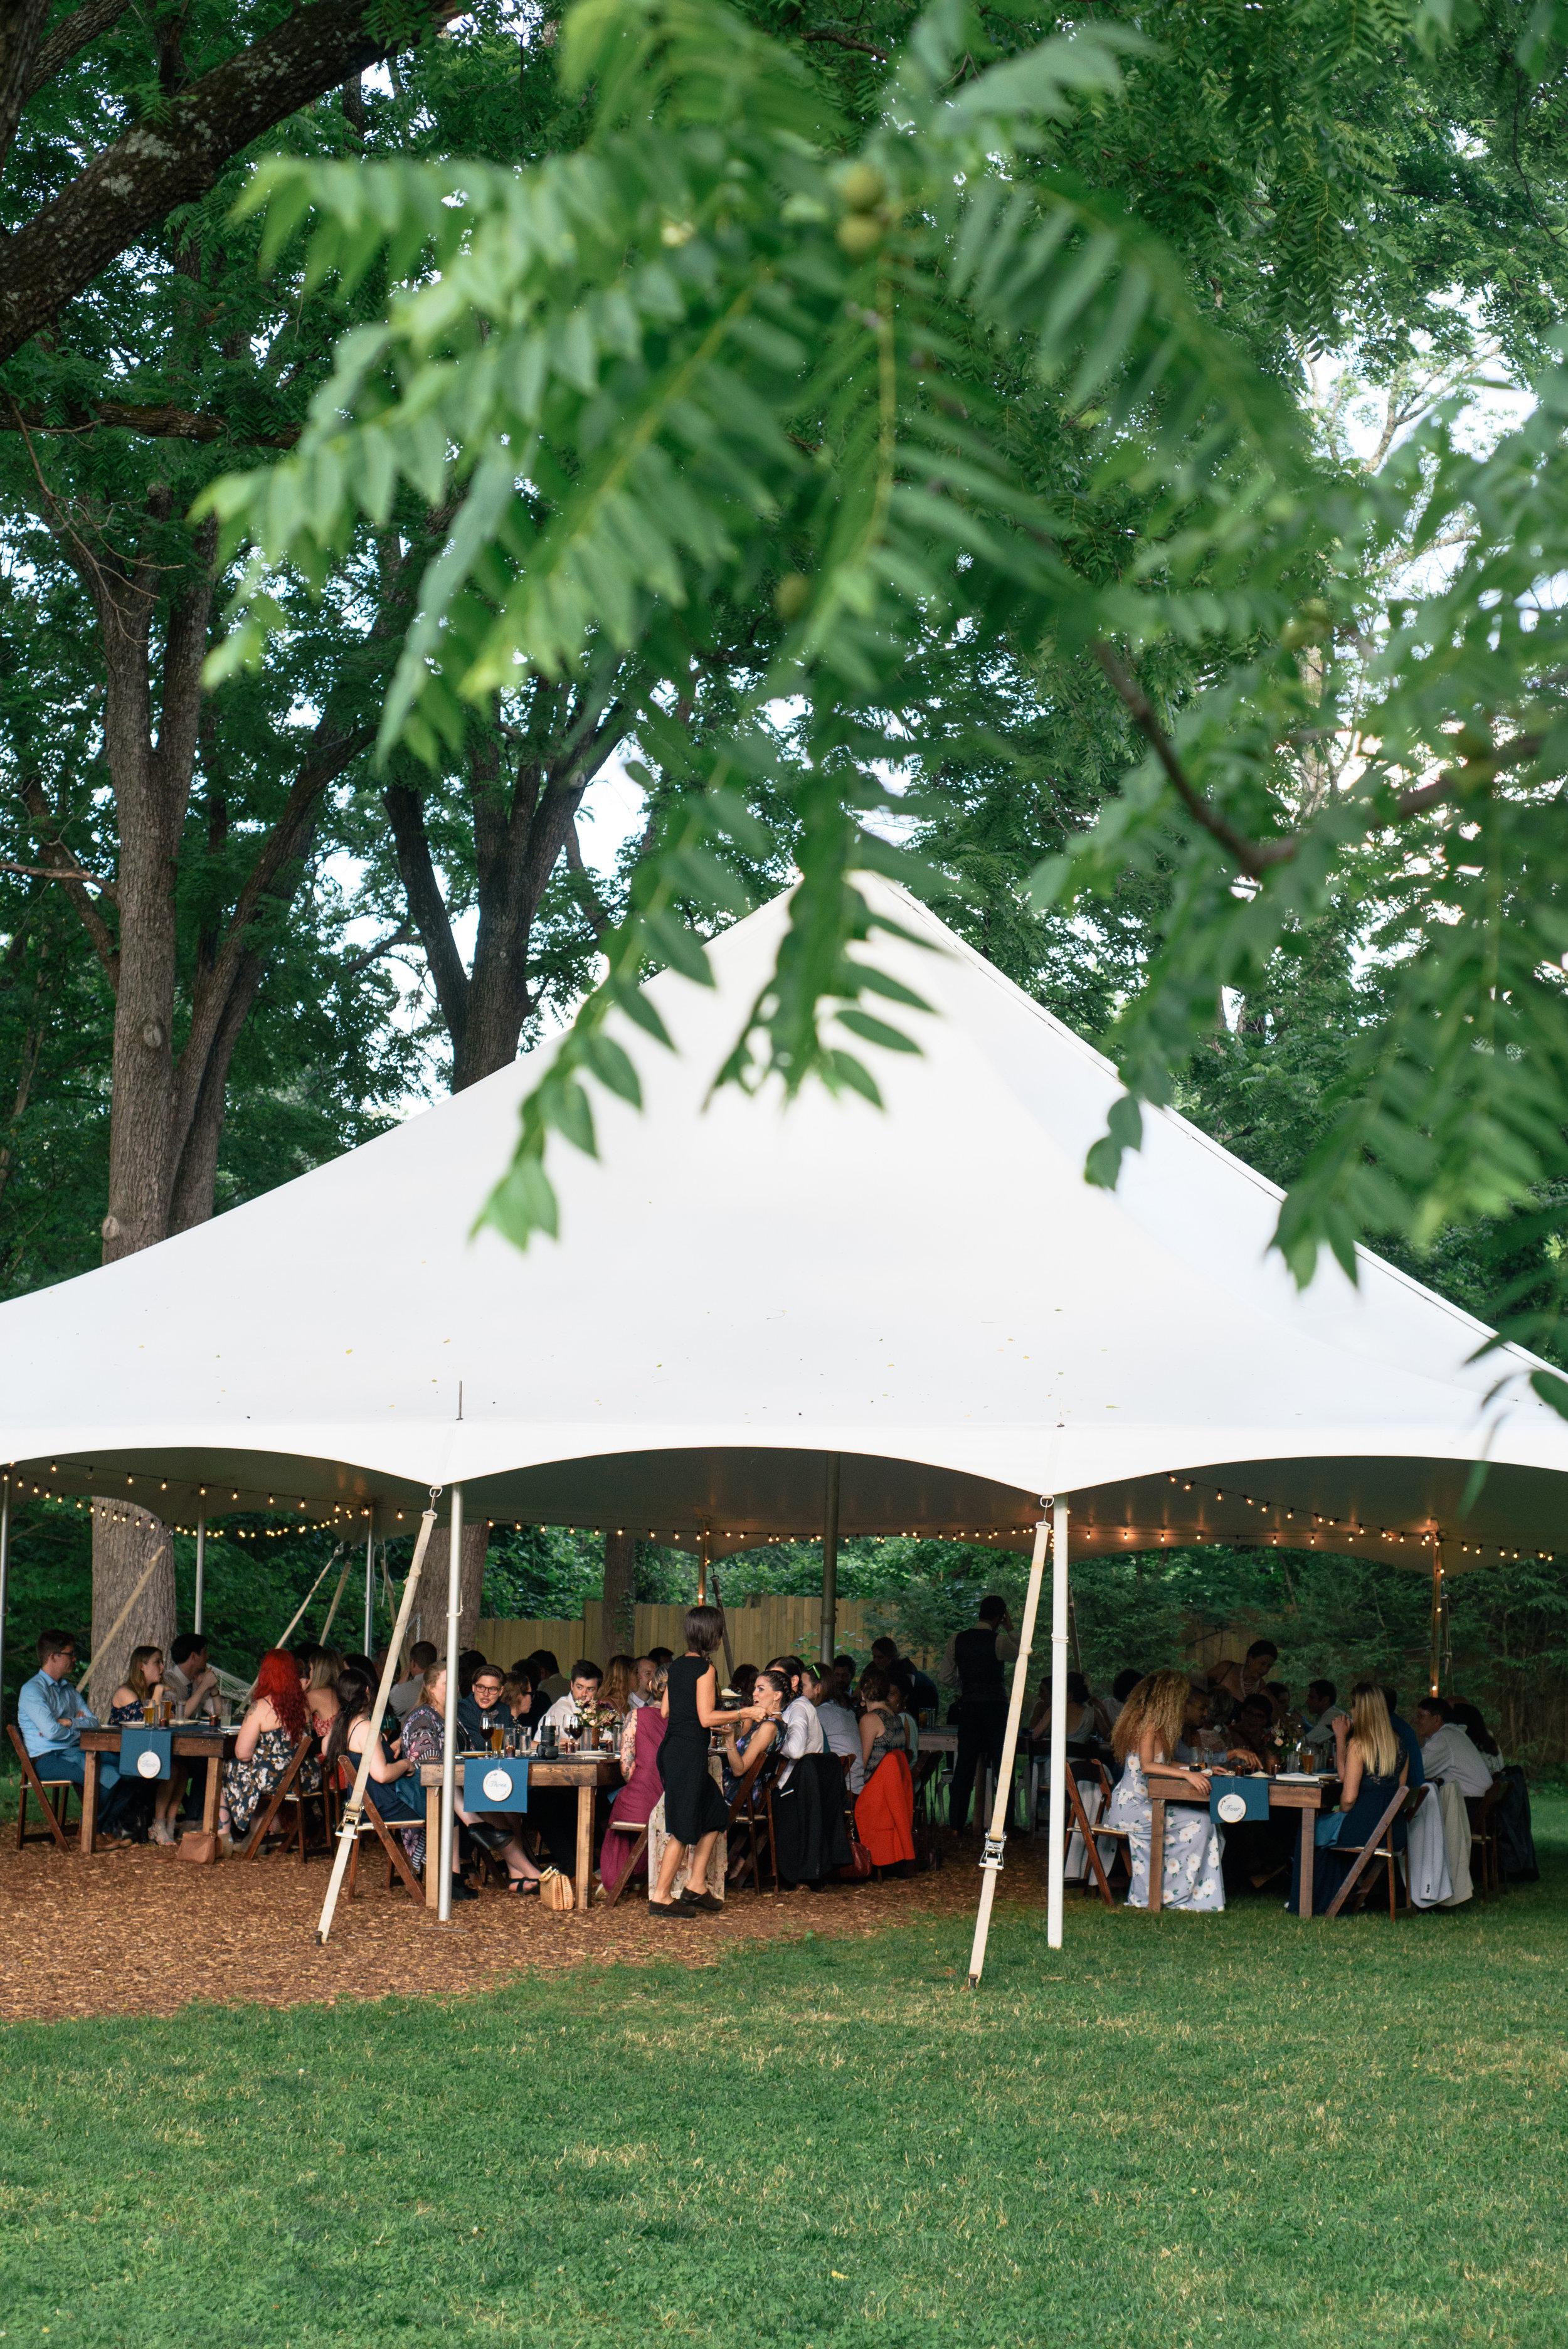 lauren-and-tim-north-carolina-wedding-meg-hill-photo- (1099 of 1087).jpg